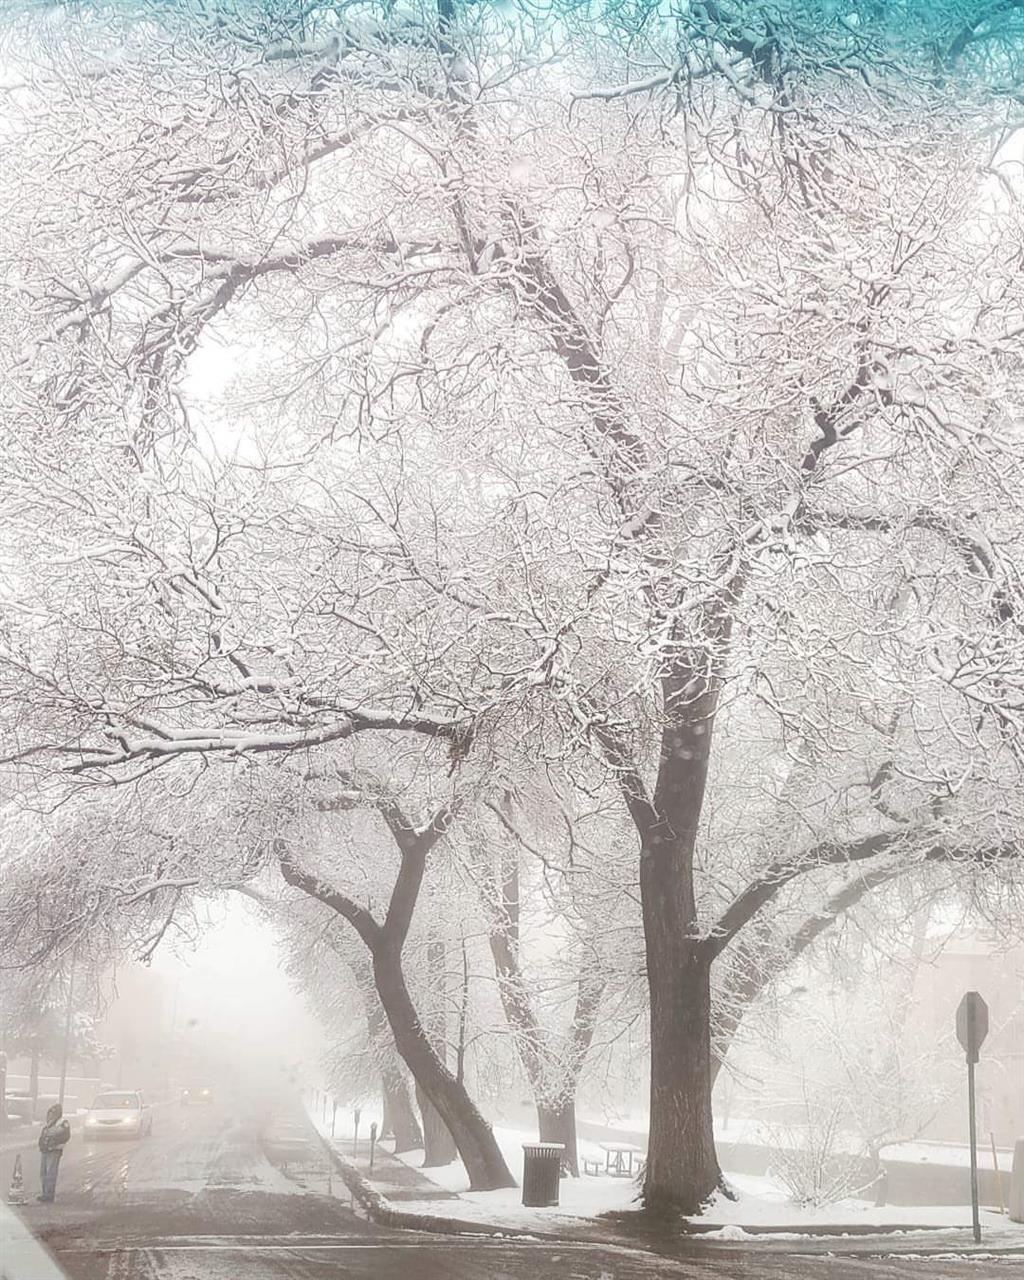 Winter in Downtown Santa Fe, NM